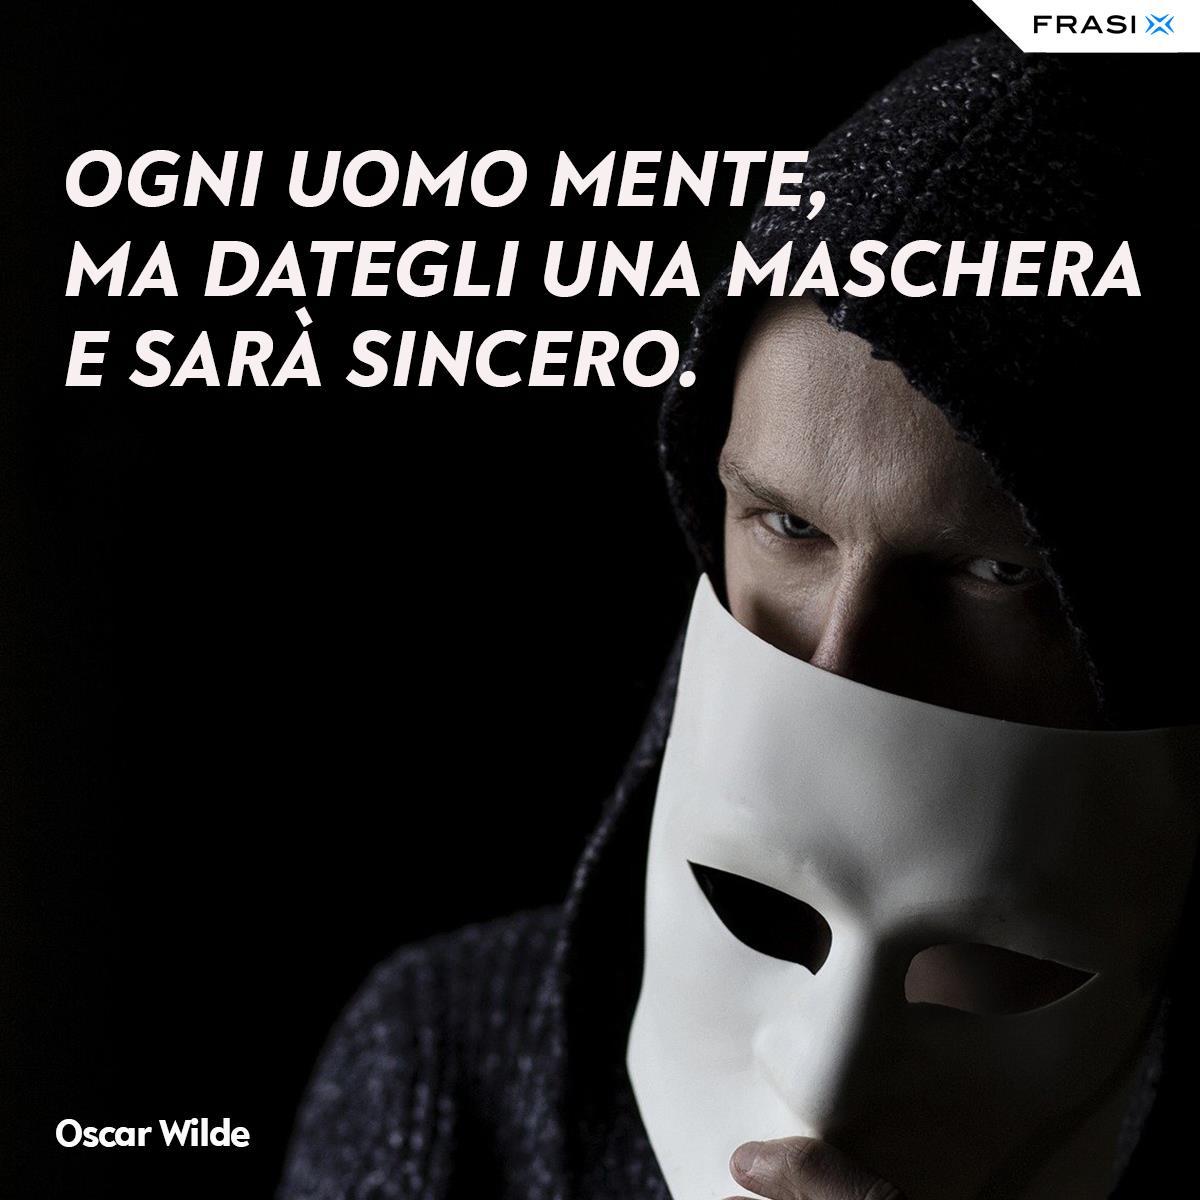 Frasi sulle maschere Oscar Wilde